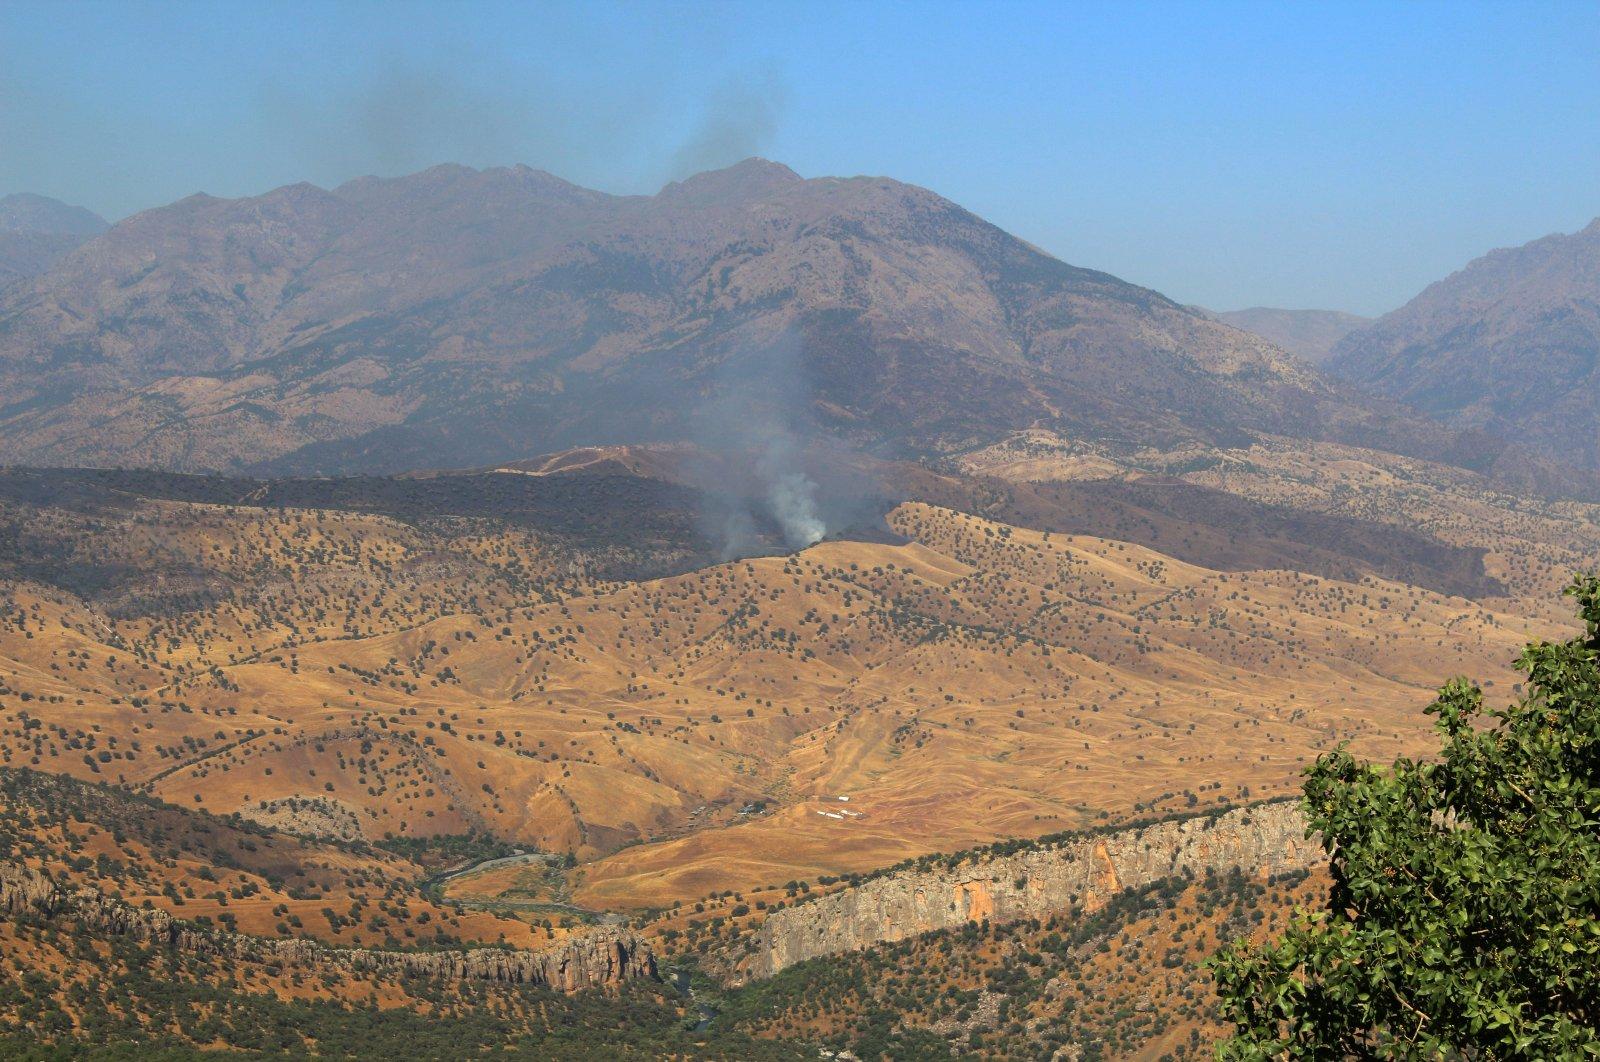 The Qandil area in northern Iraq, where PKK terrorists' camps are located. (IHA File Photo)